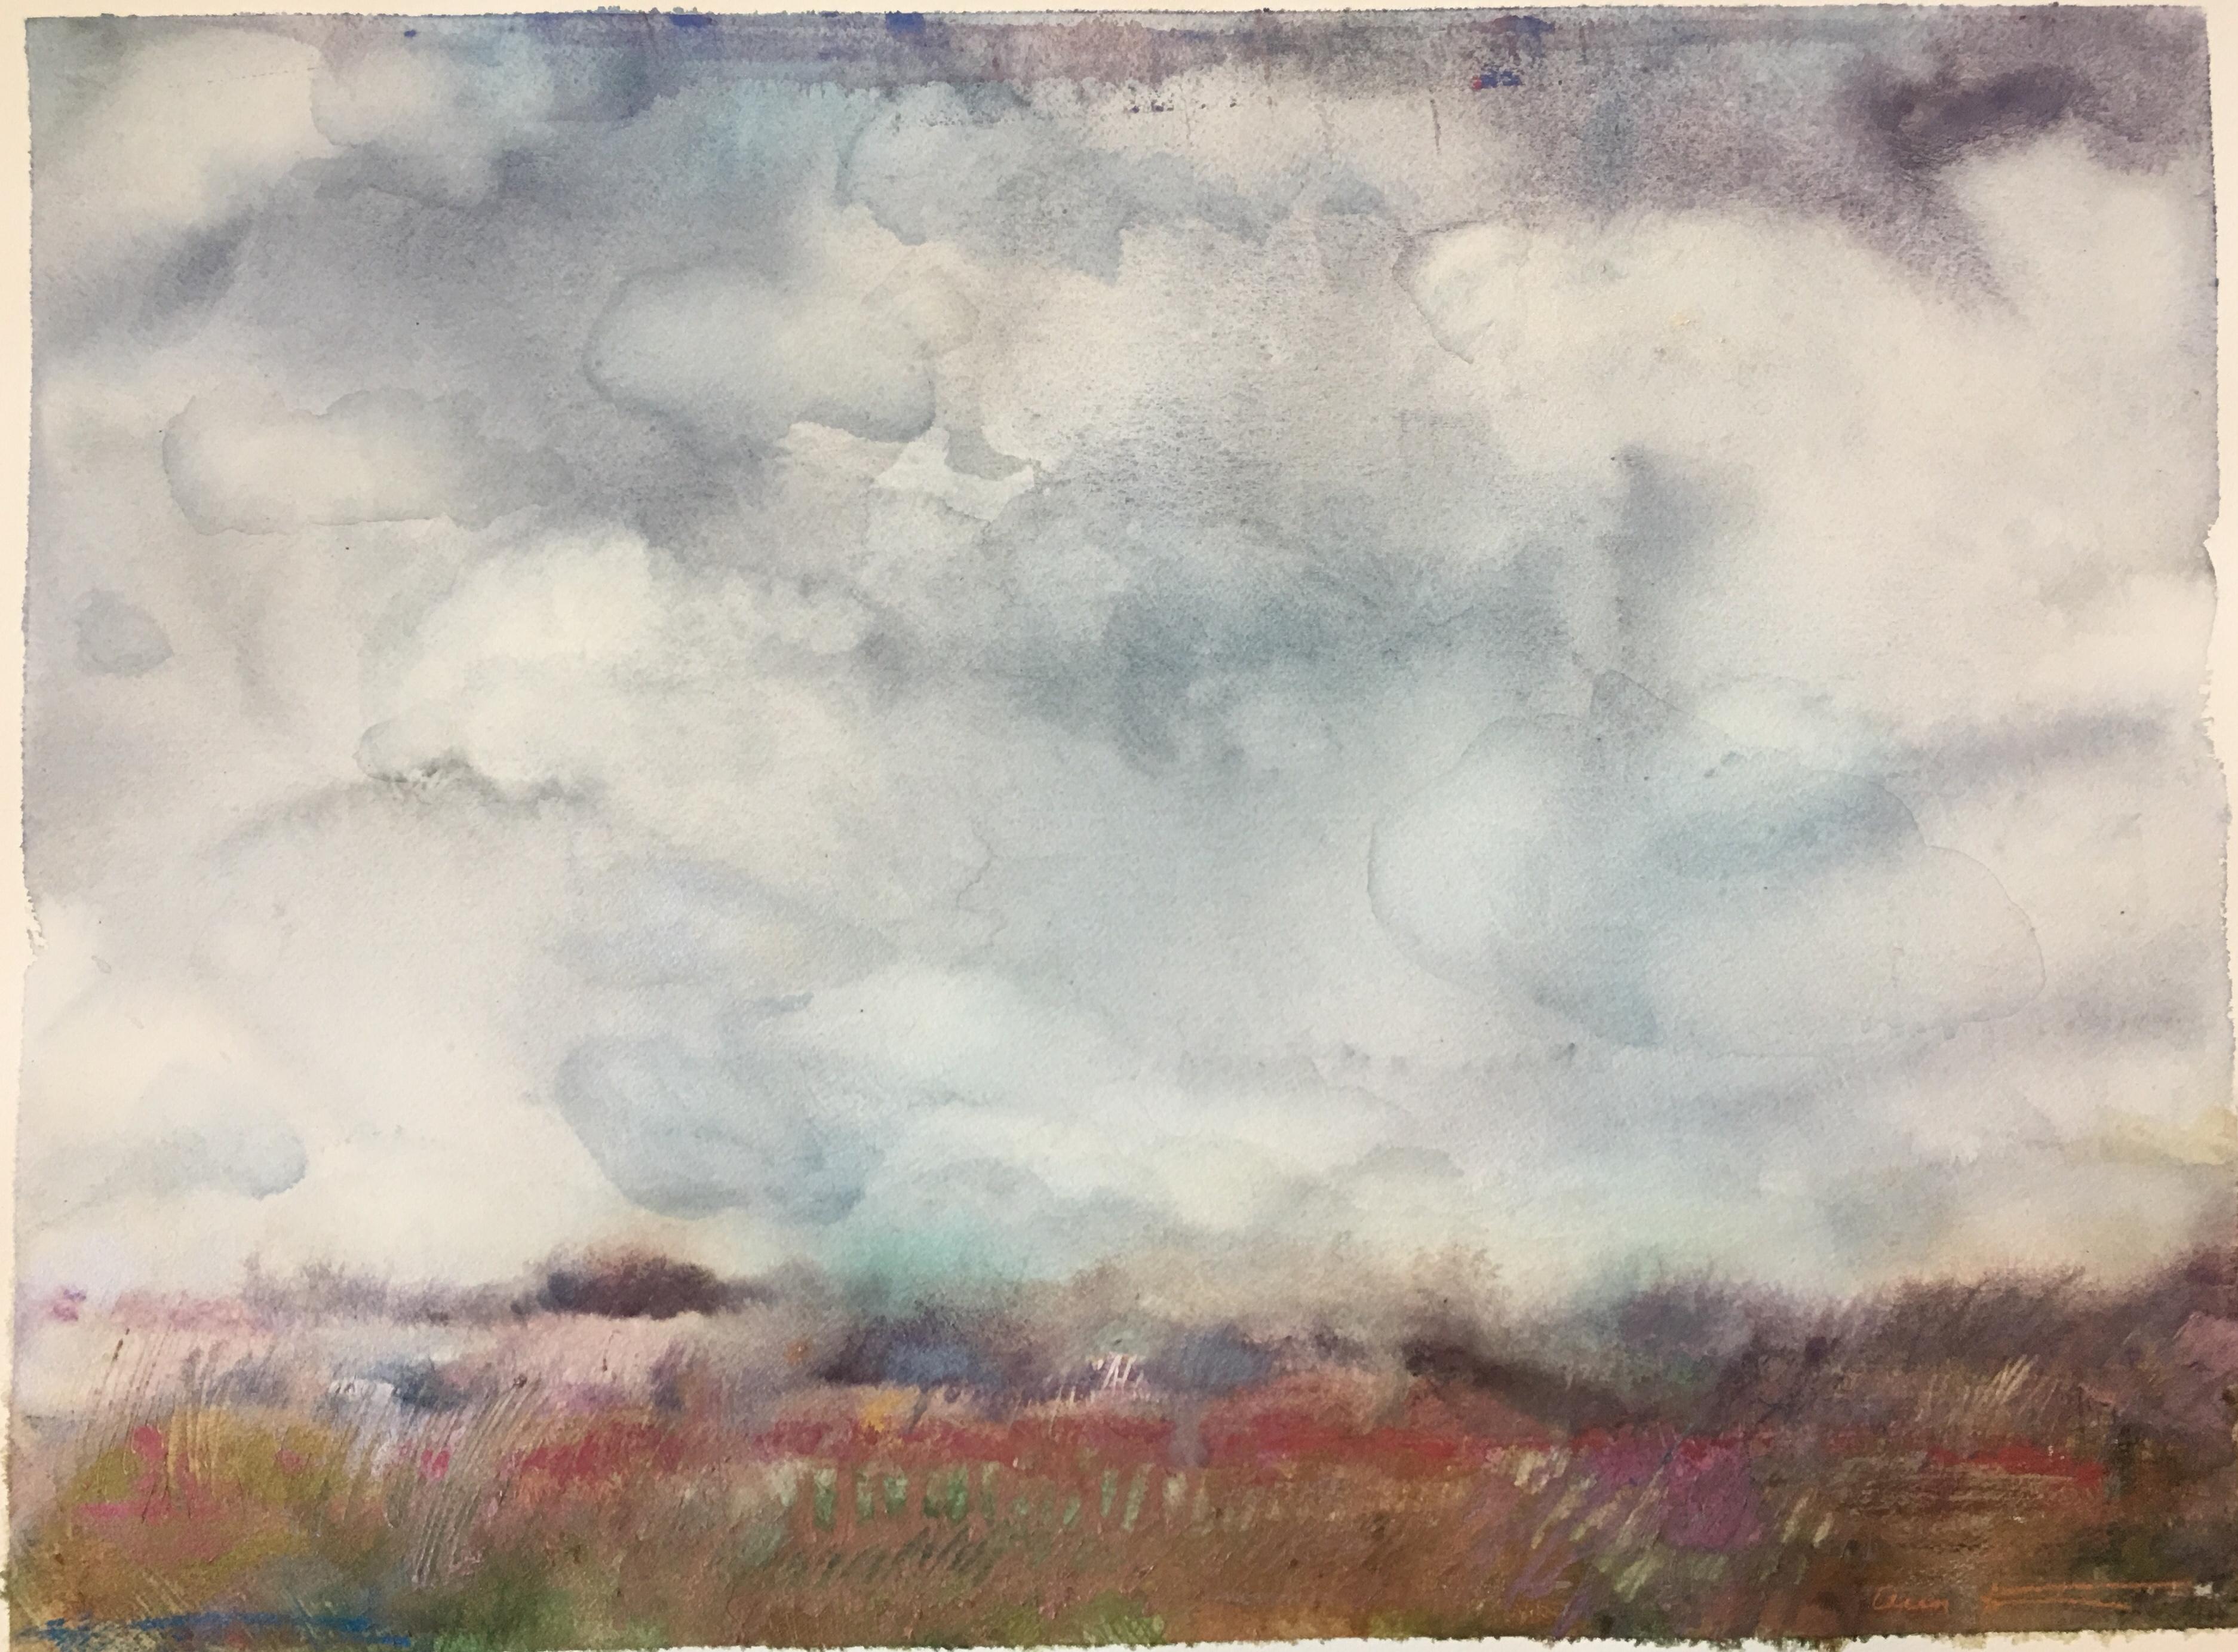 Brushland by Ann Stretton